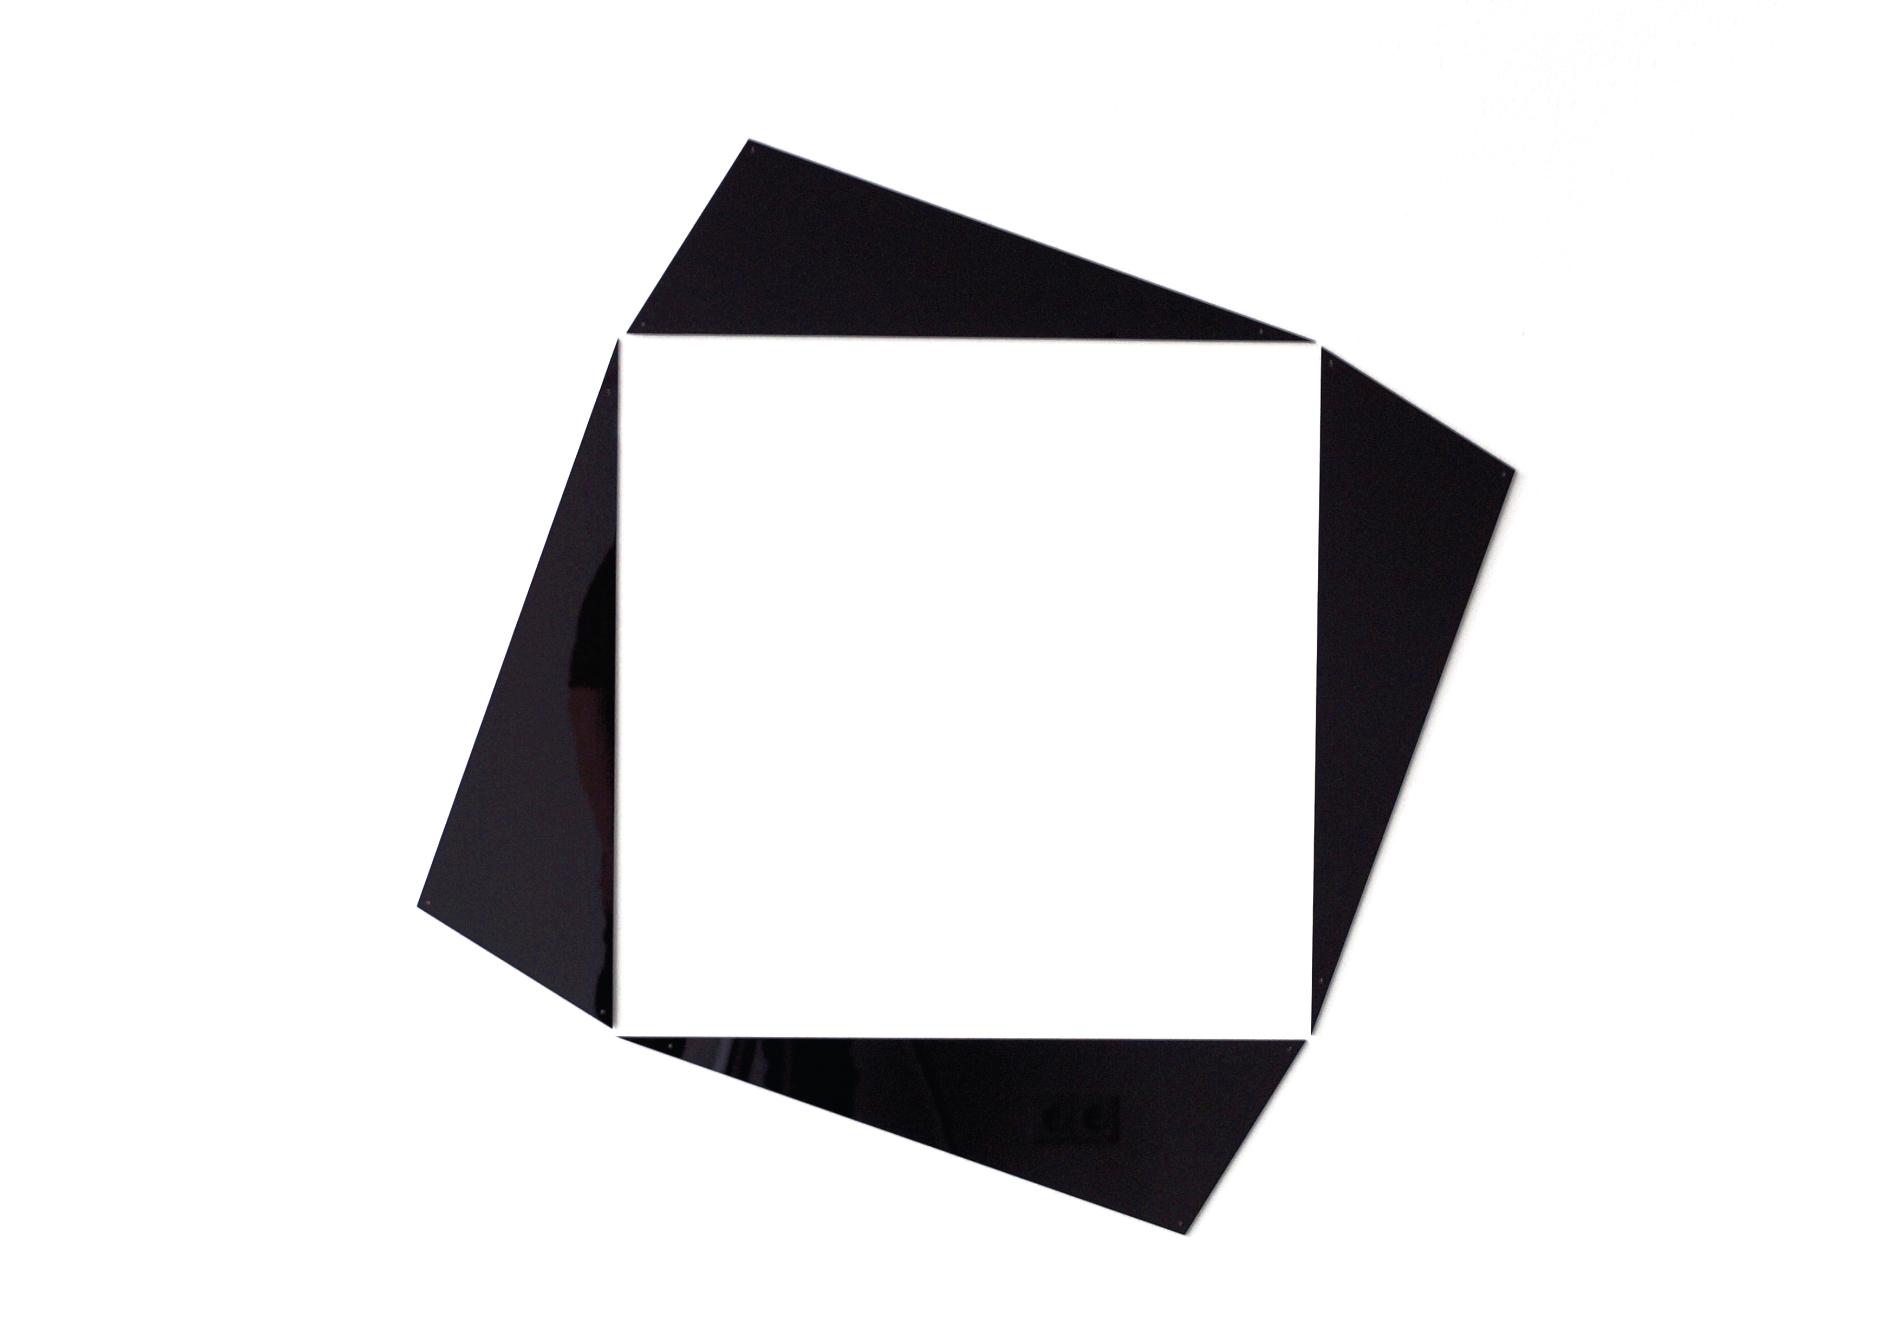 insideout square #1_2017_black perspex_92 x 92 x 0,3 cm edition 3 + e.a.